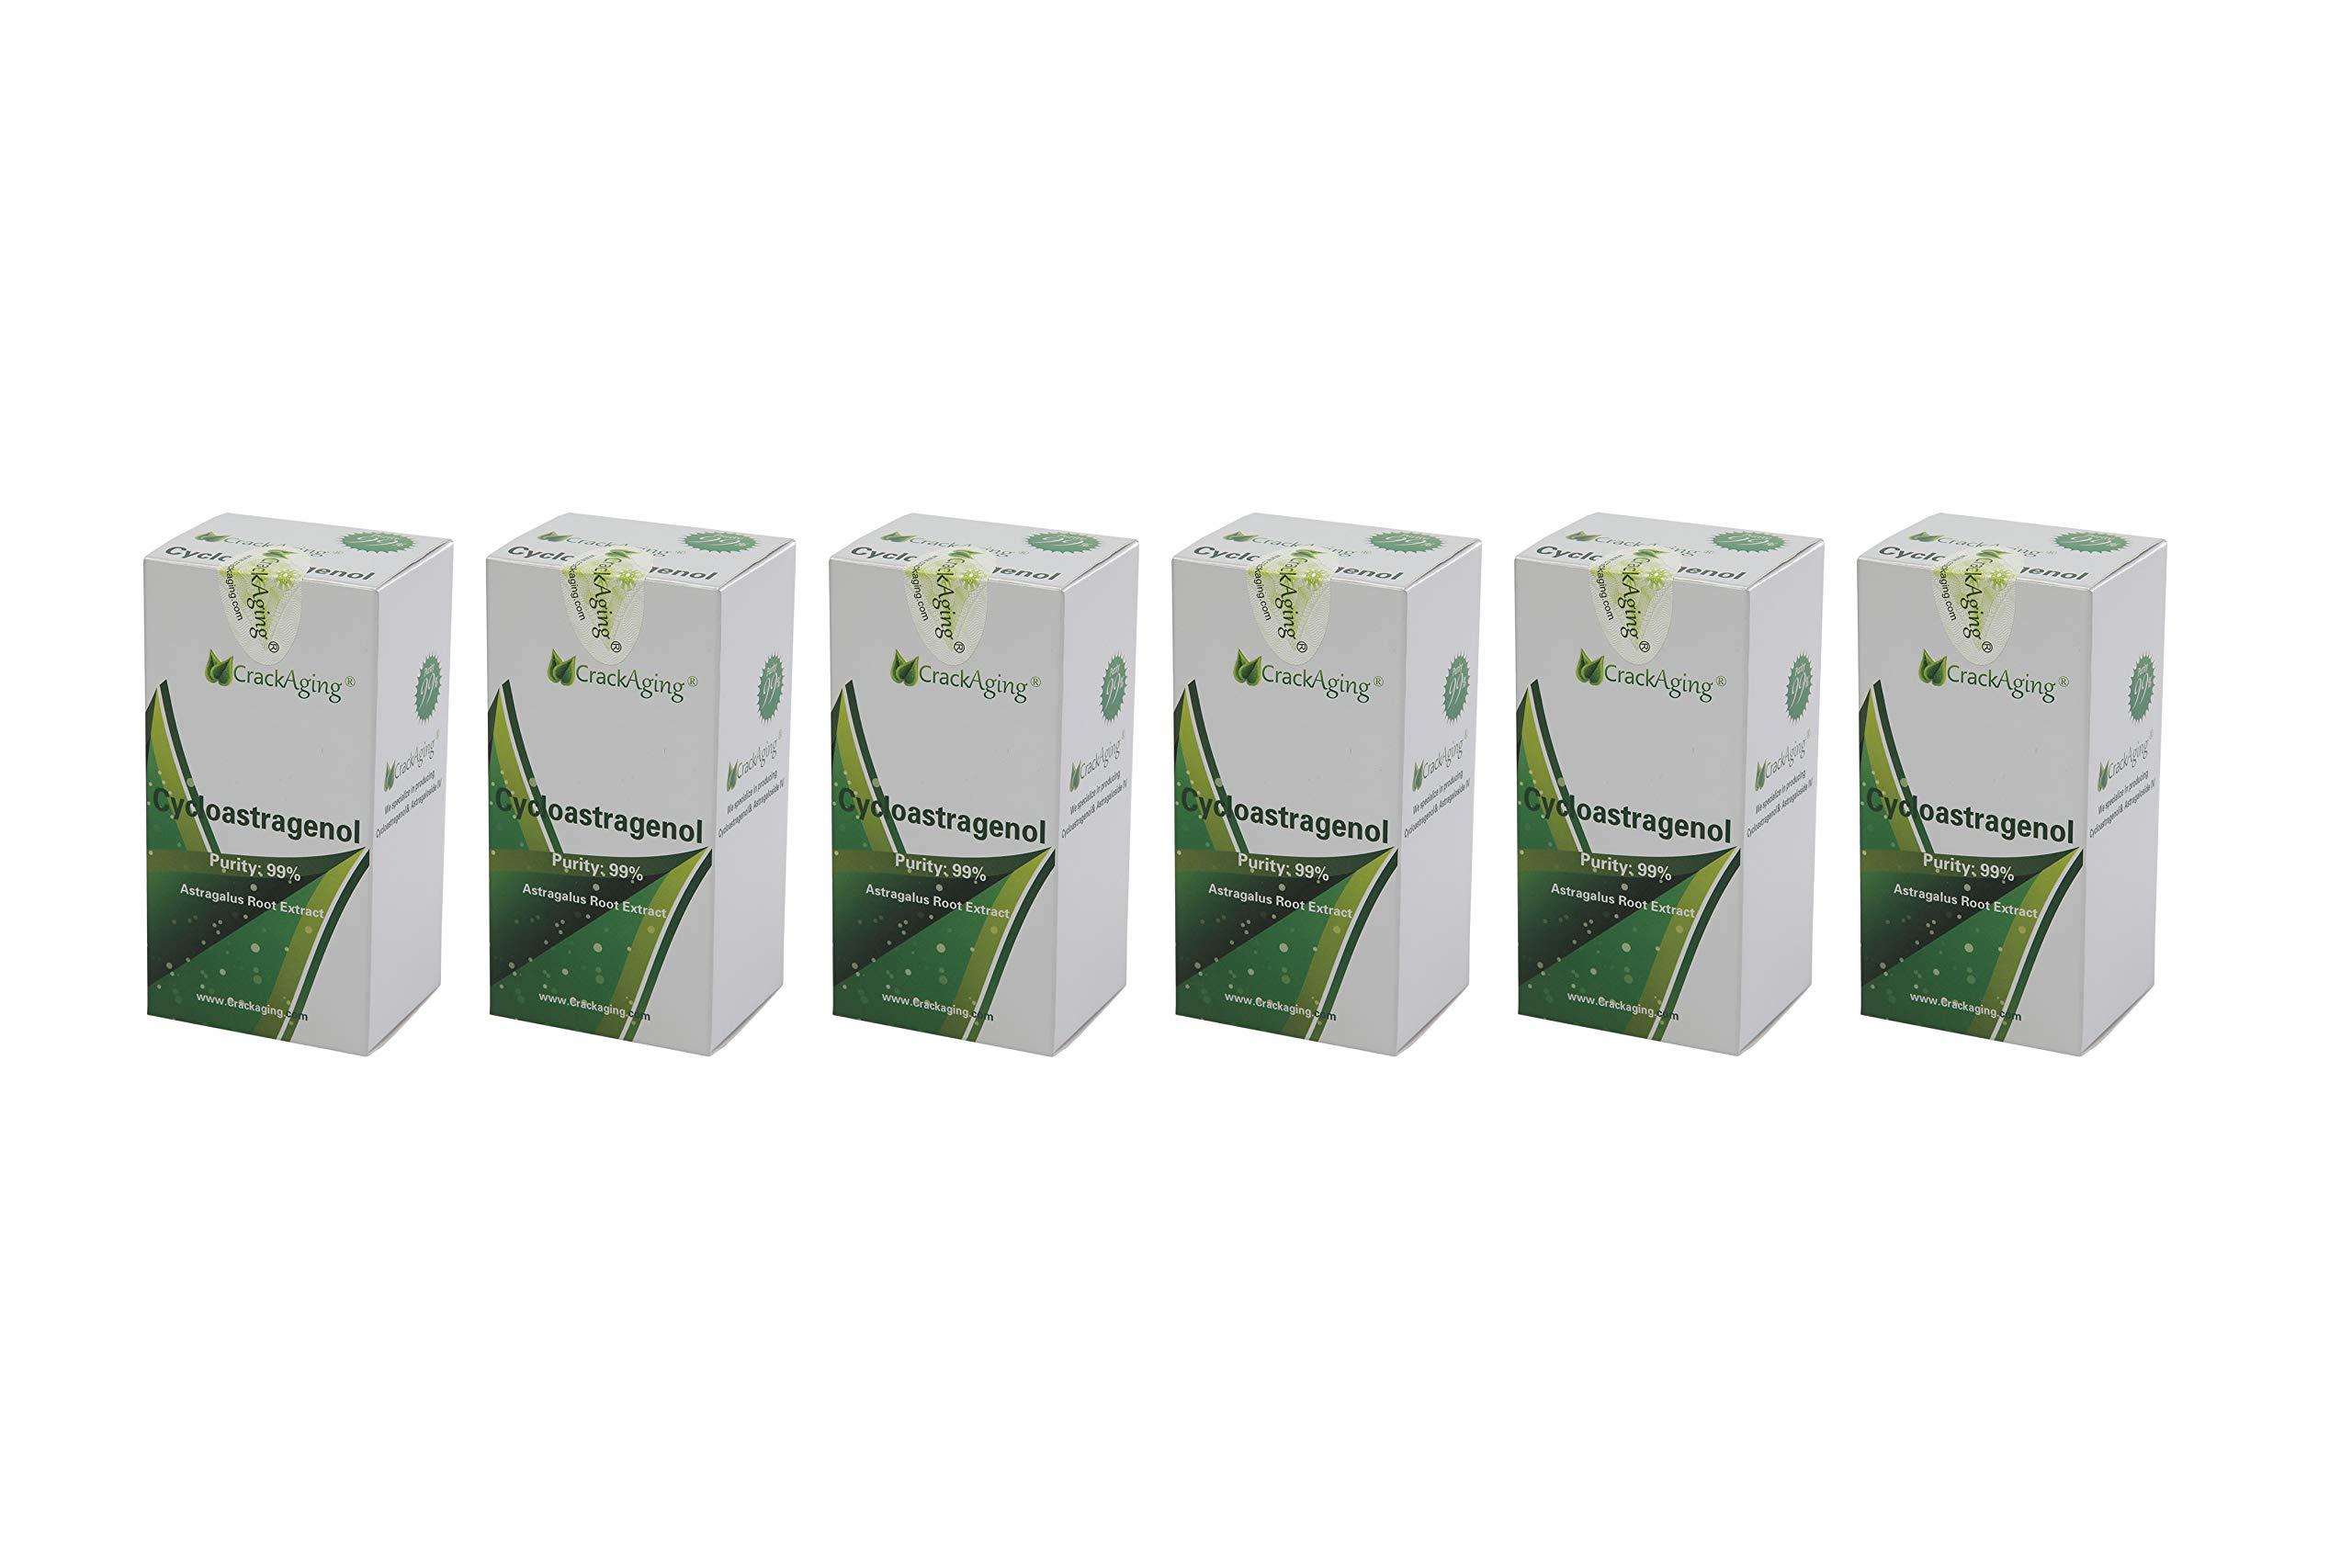 Super-Absorption Cycloastragenol 98% (10mg/Cap, 360 Caps in 6 Bottles)-Telomere & Anti-Aging Supplement Veggie Capsules